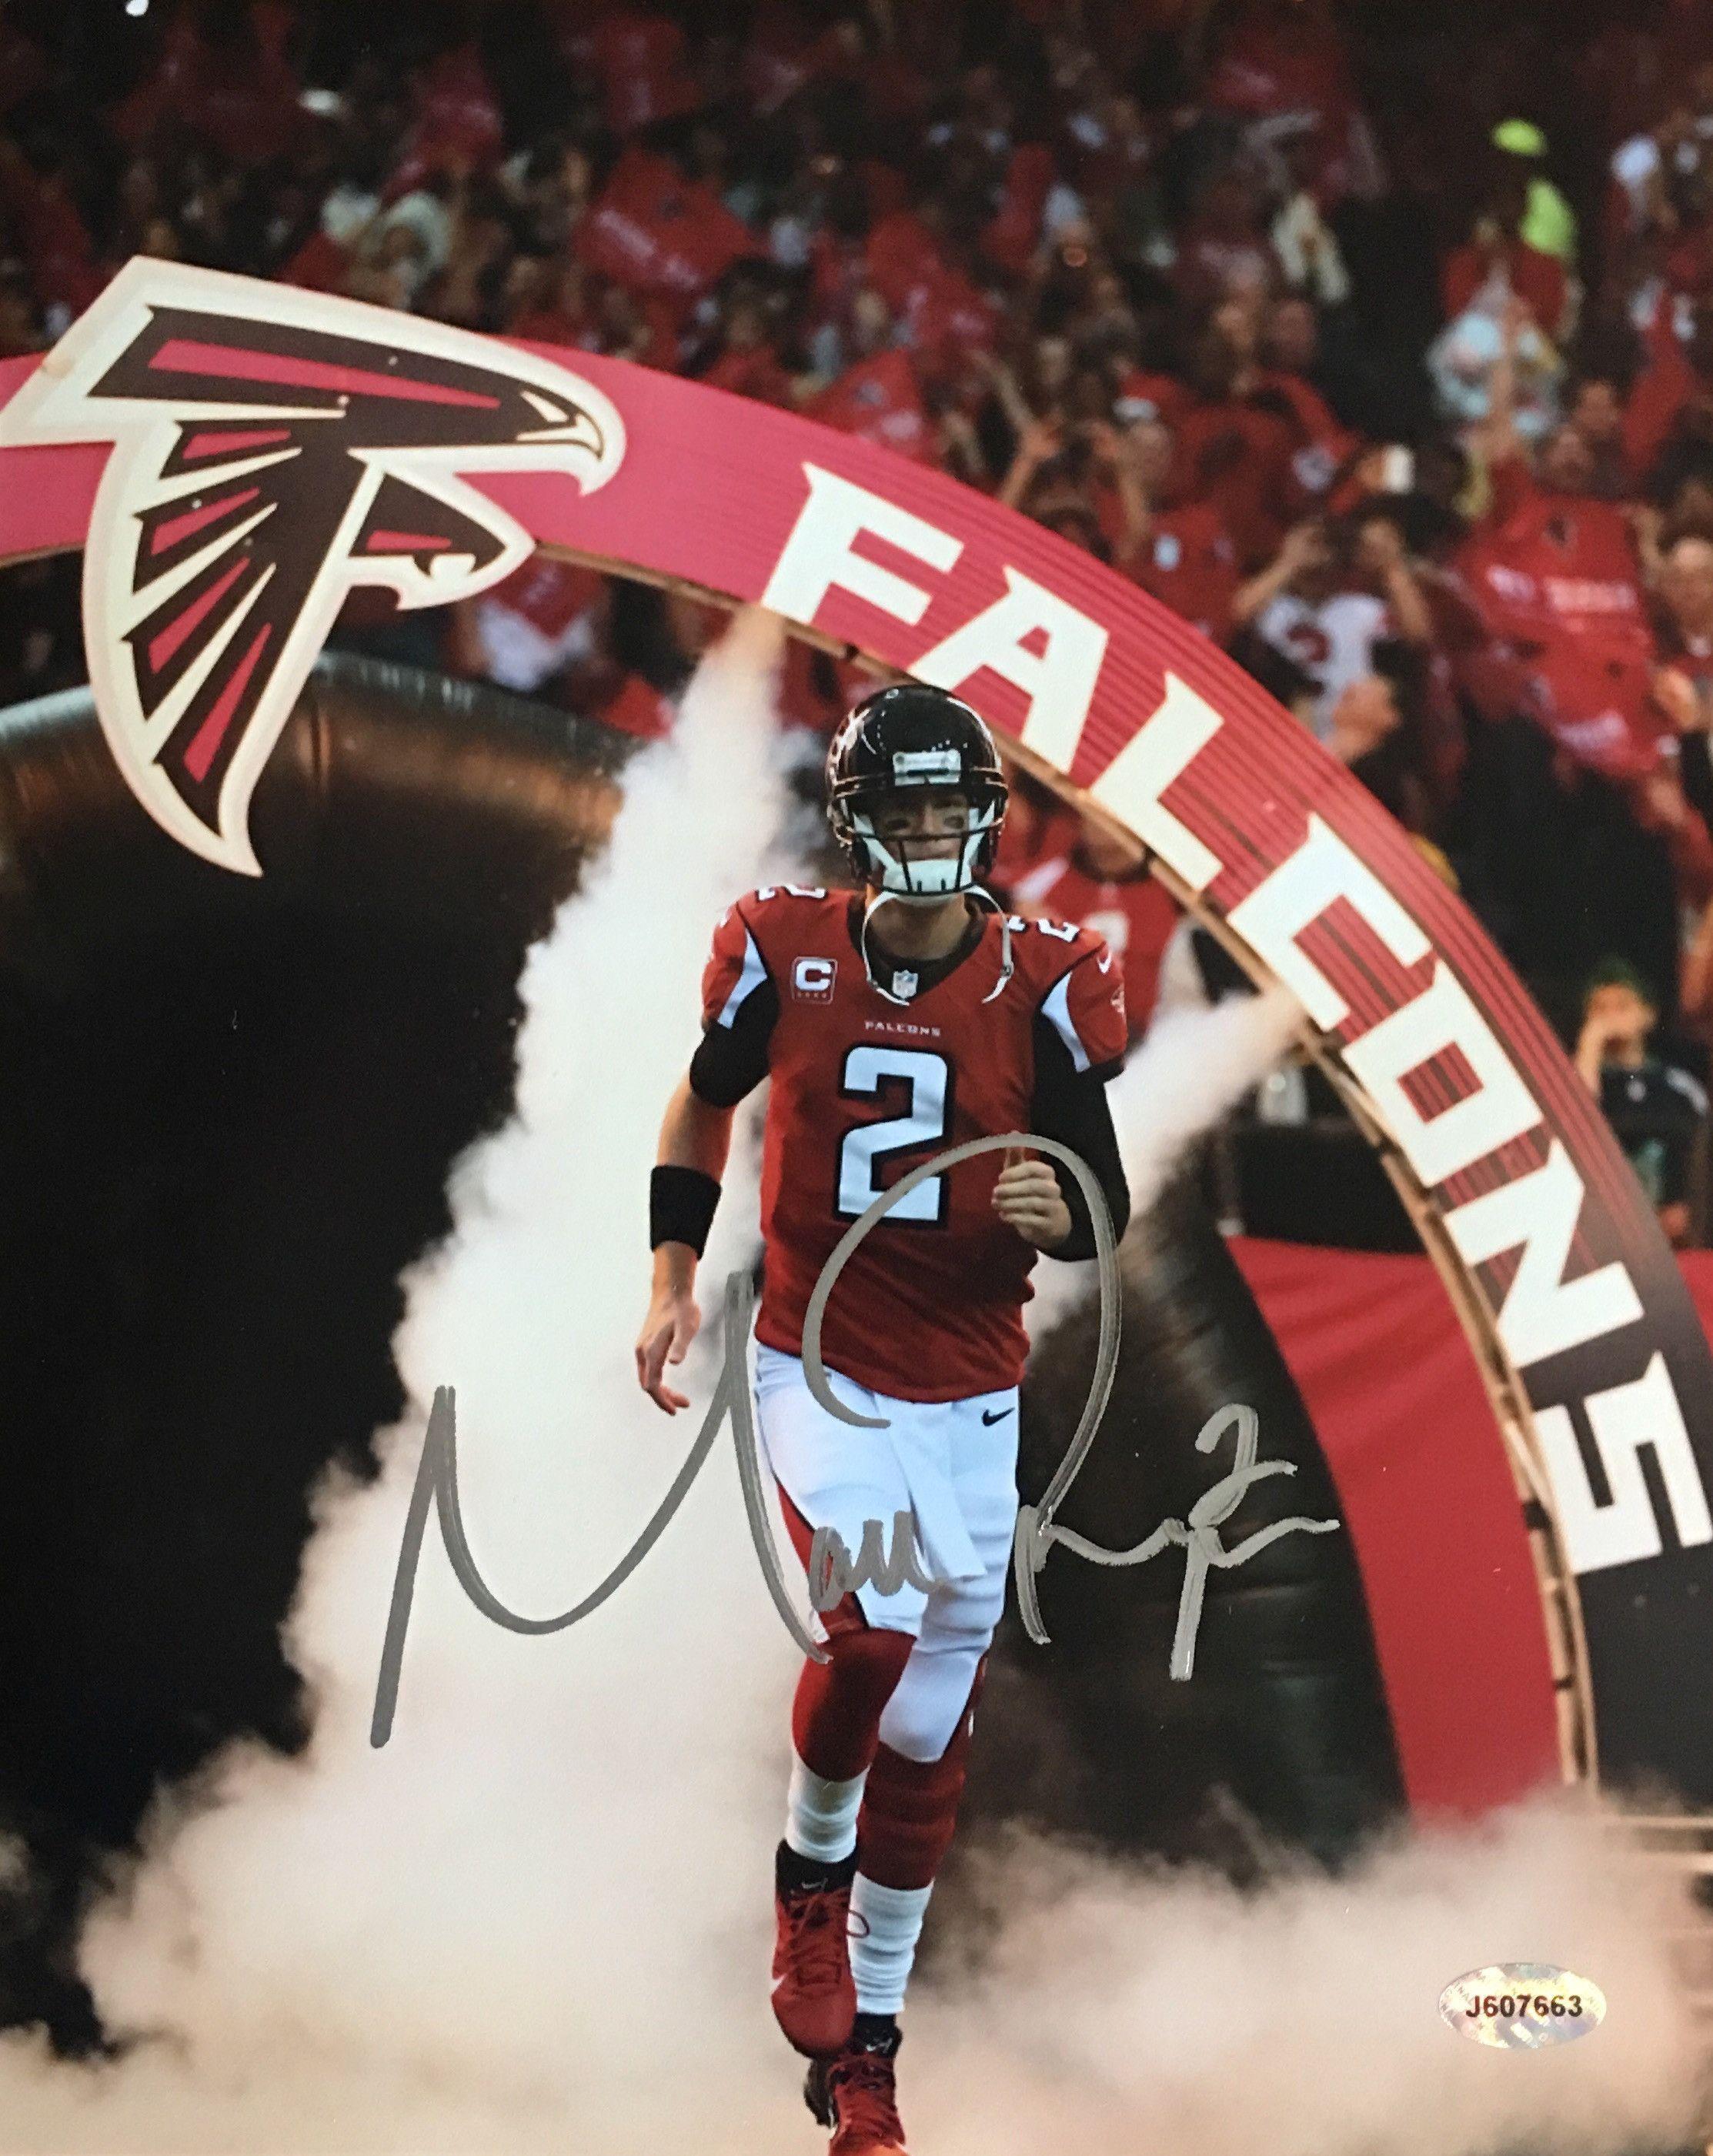 Matt Ryan Atlanta Falcons Signed 8x10 Photo